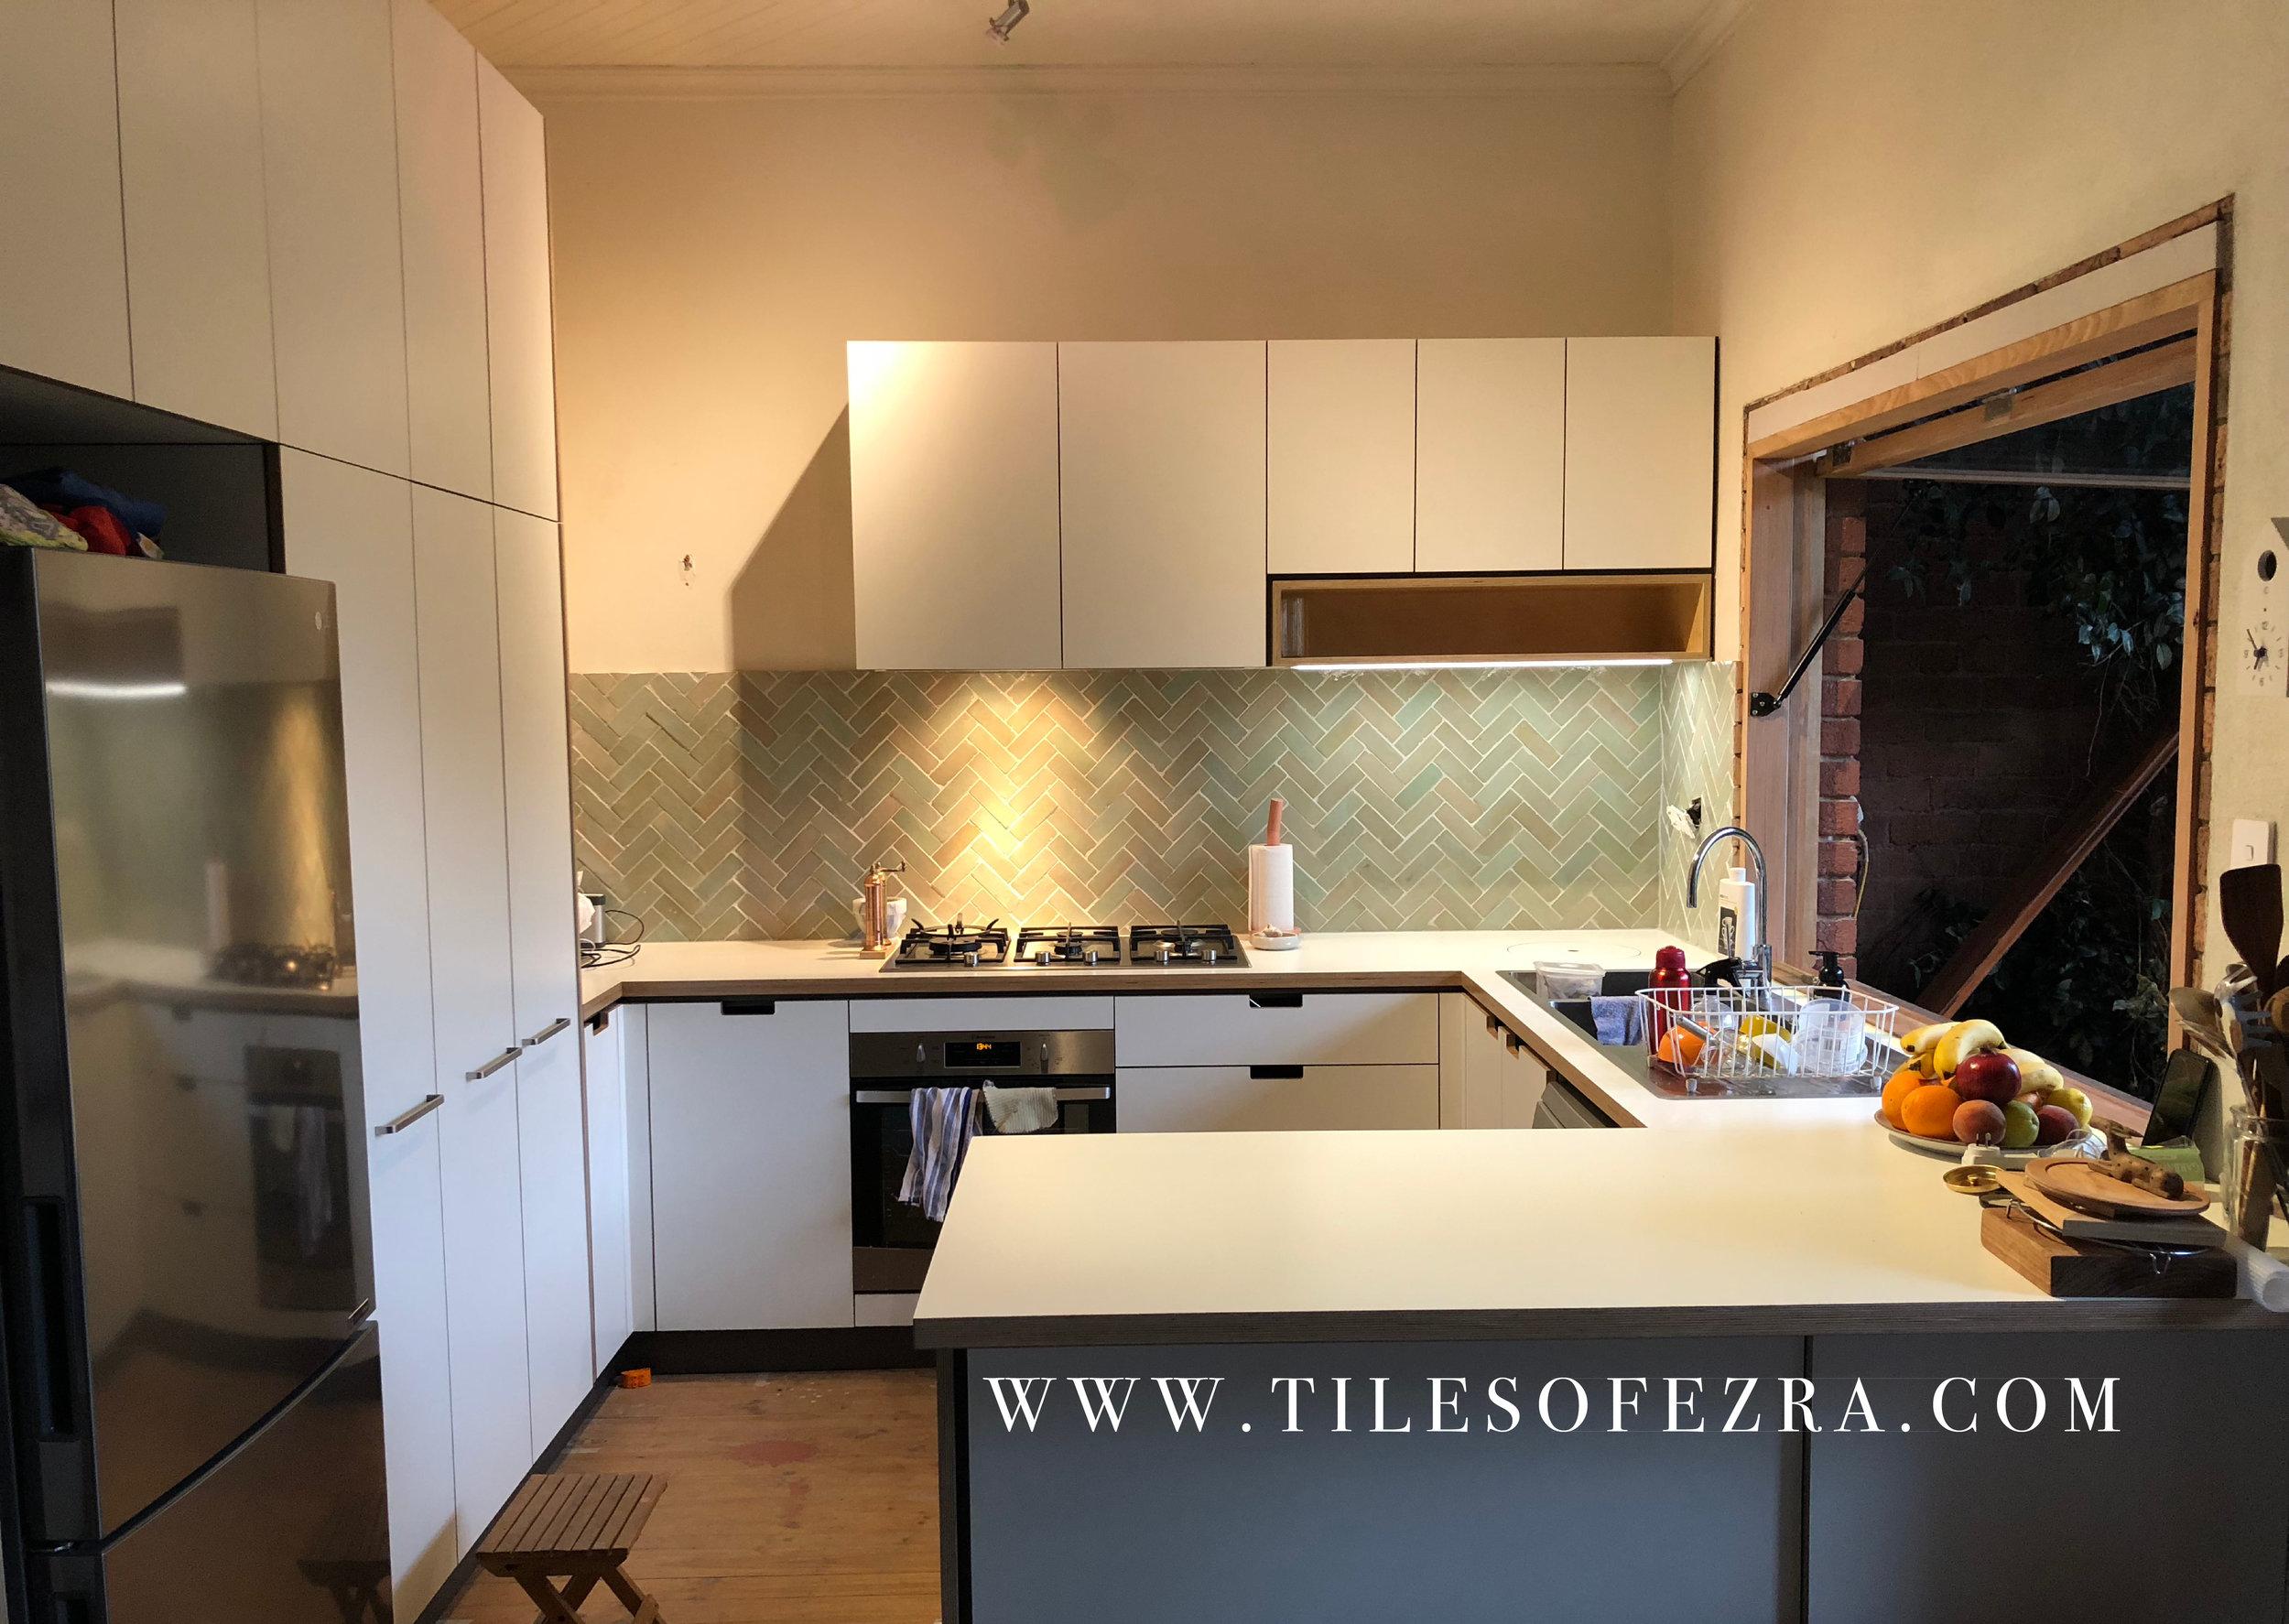 Tiles of Ezra FL006 Aqua Kitchen.jpg